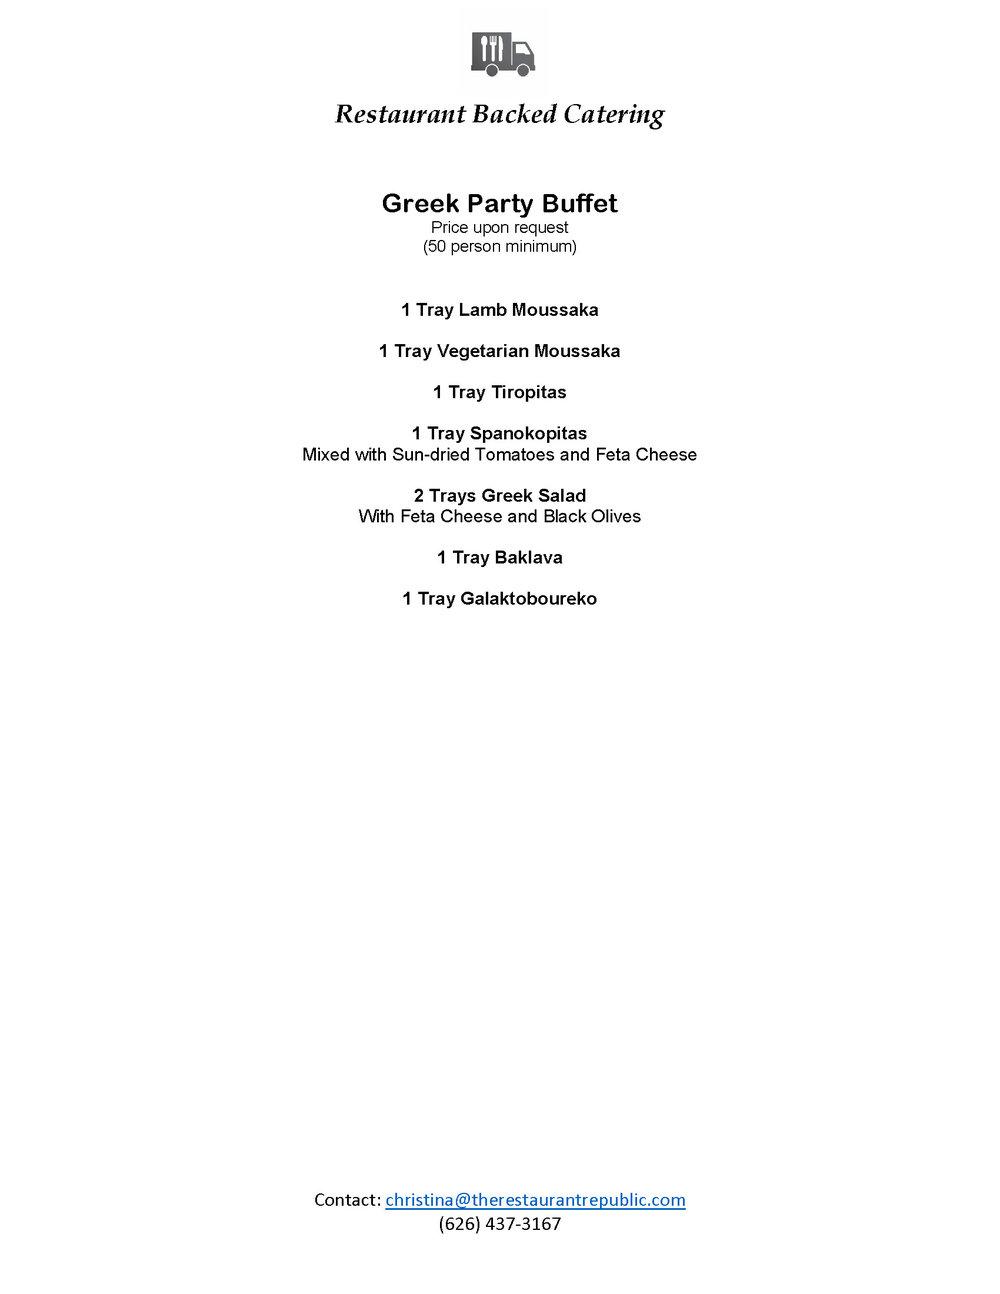 rbacked greek party buffet menu.jpeg